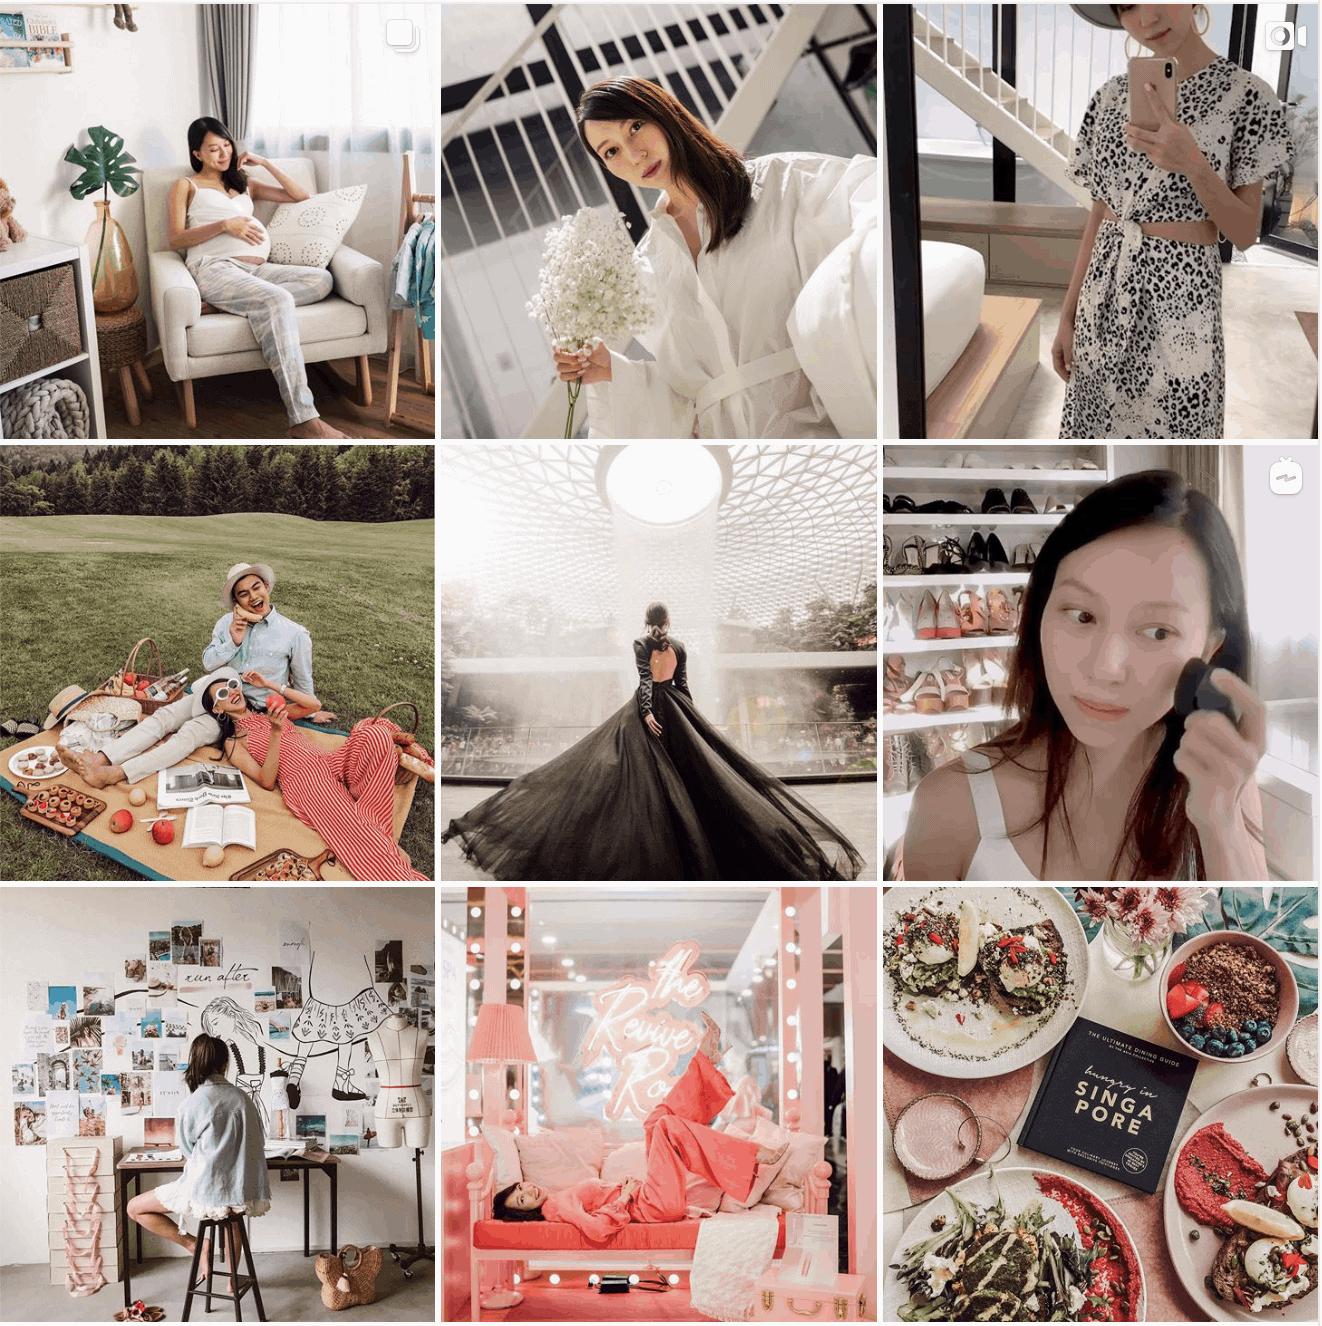 Melissa Koh Instagram